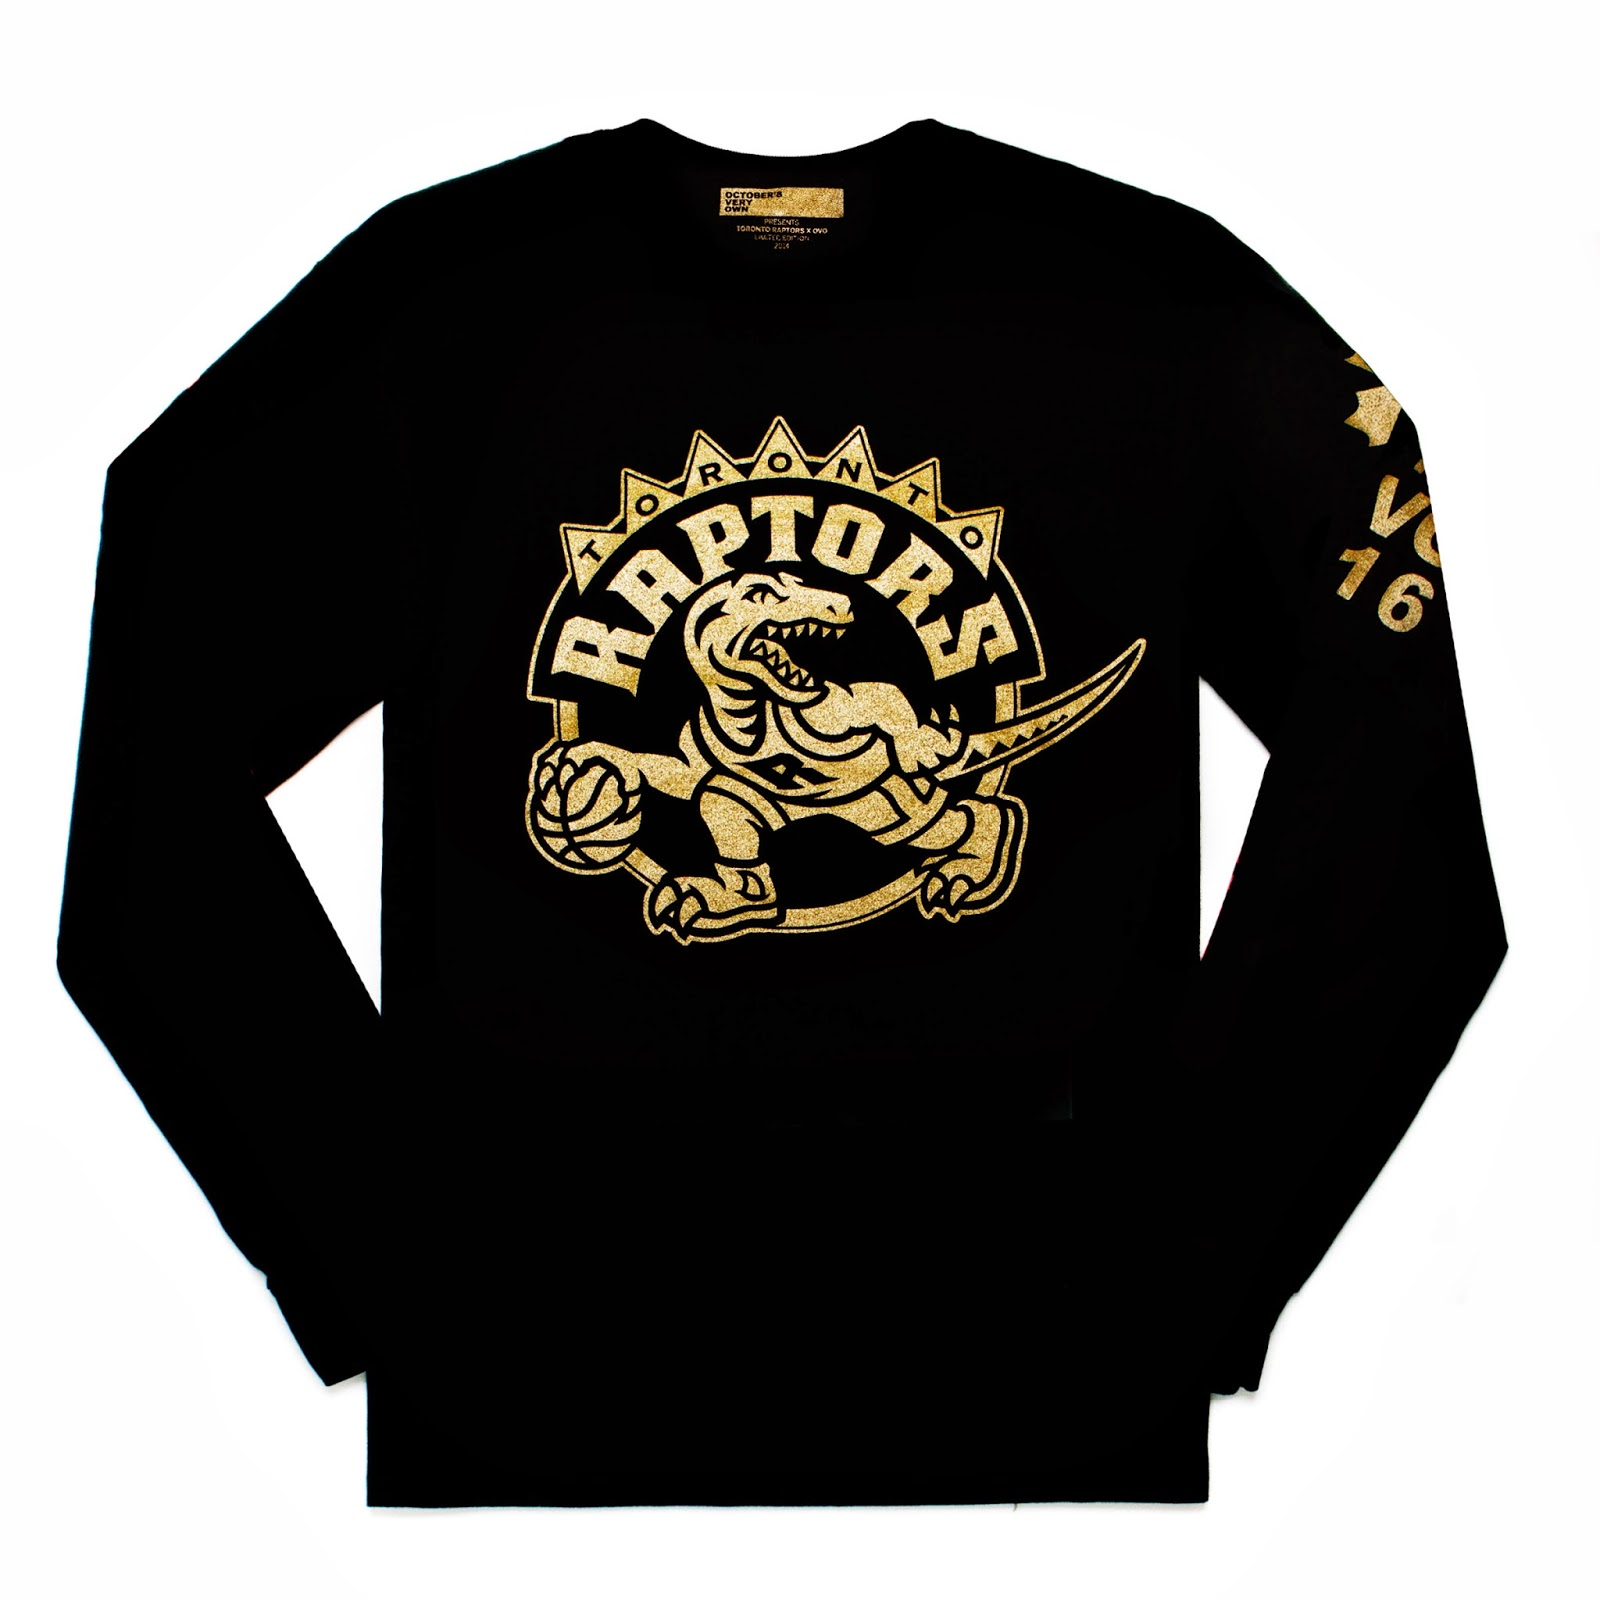 4e5be409926 Raptors x OVO T-shirt for Drake Night : torontoraptors